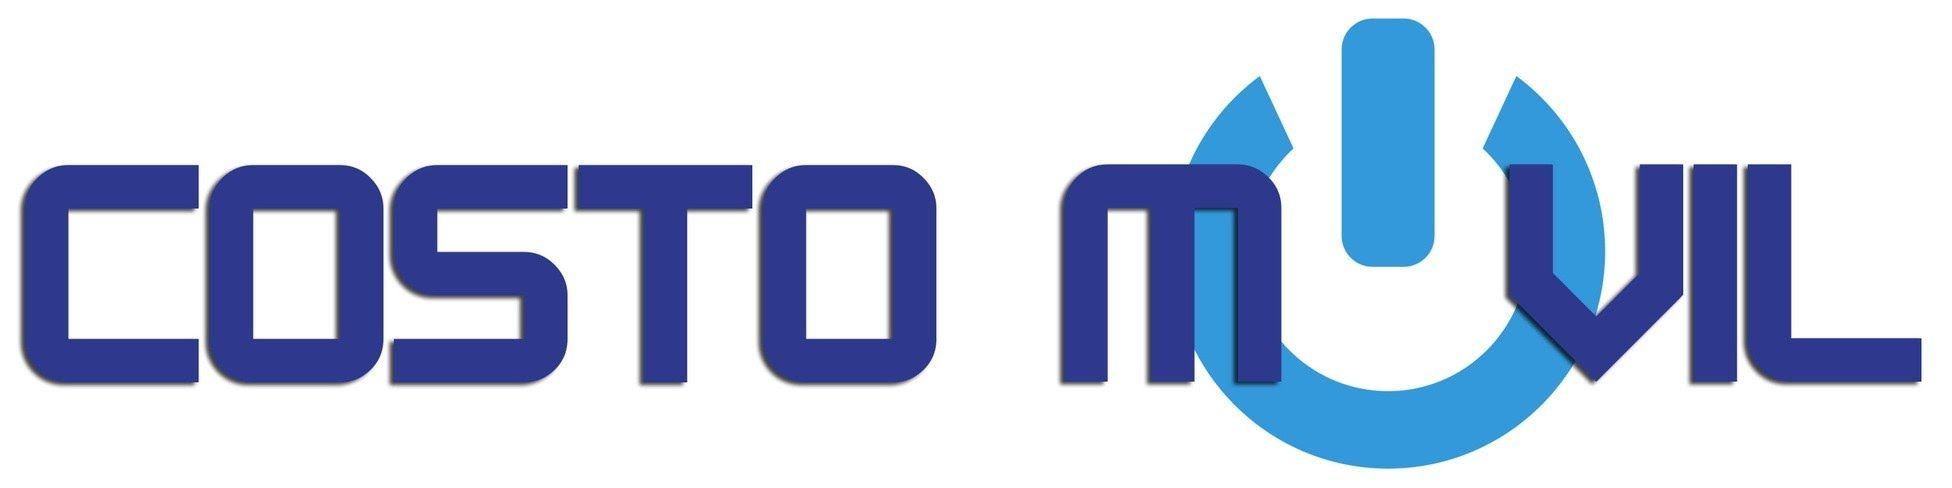 Fotografia Logotipo de Costomovil